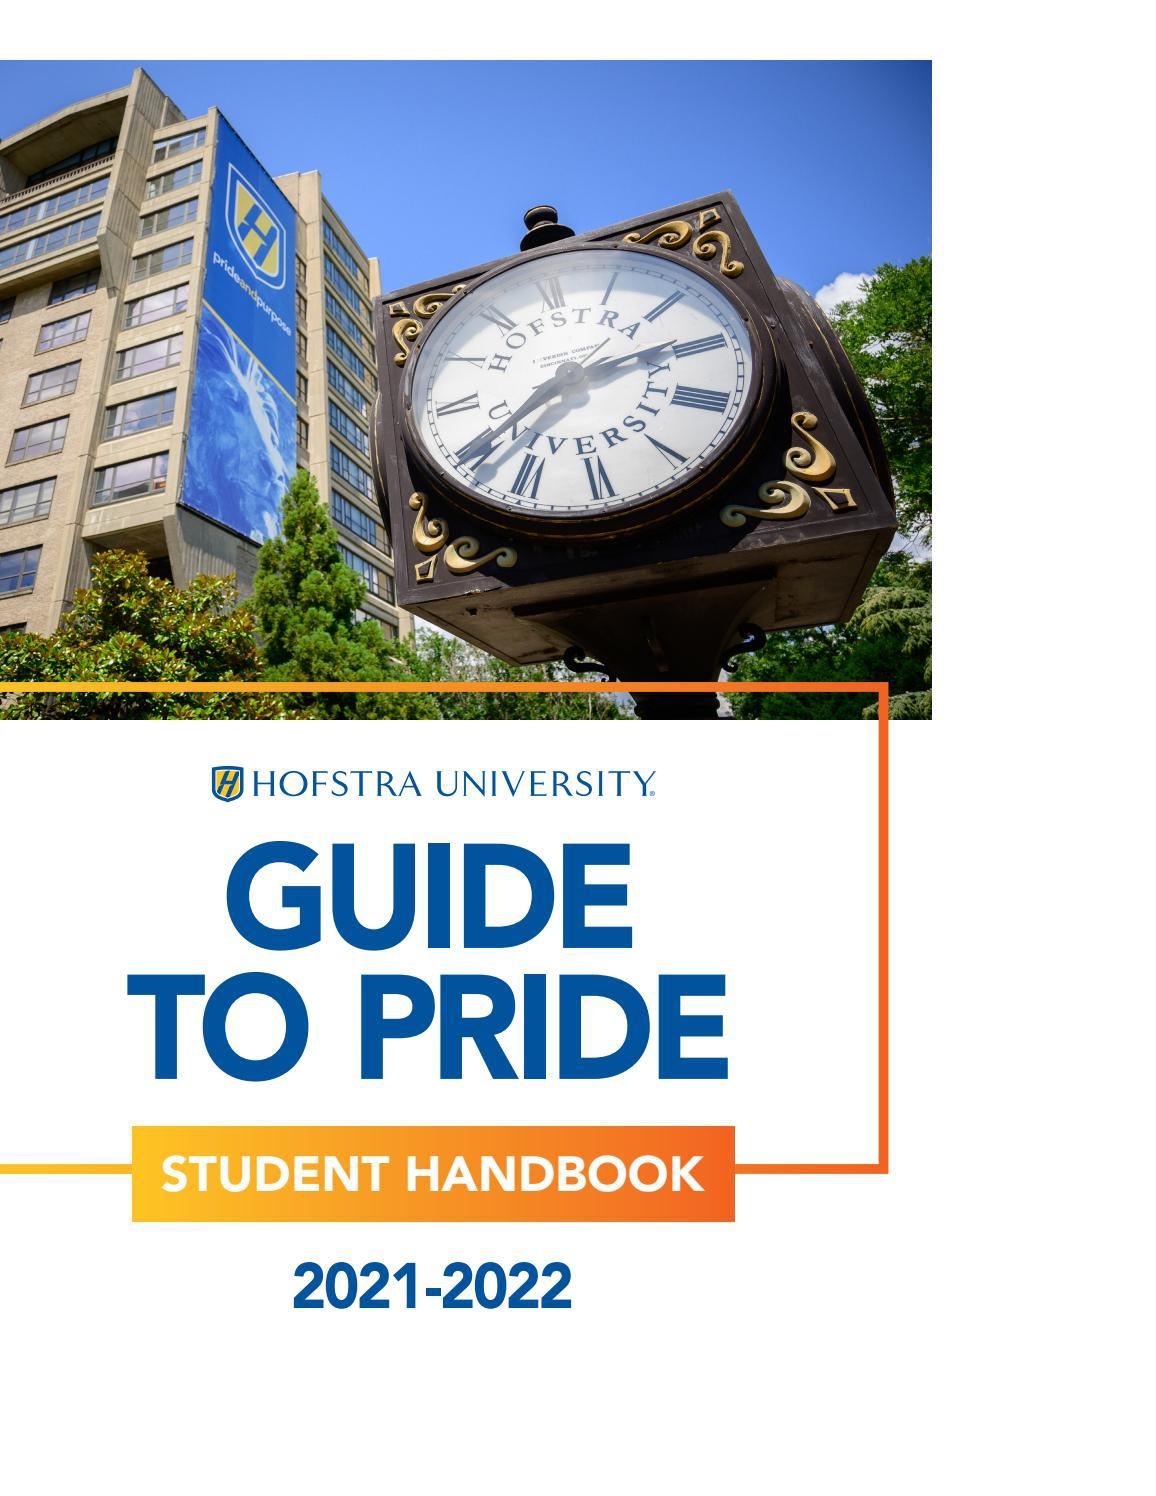 Guide to Pride - Hofstra University by Hofstra University - issuu